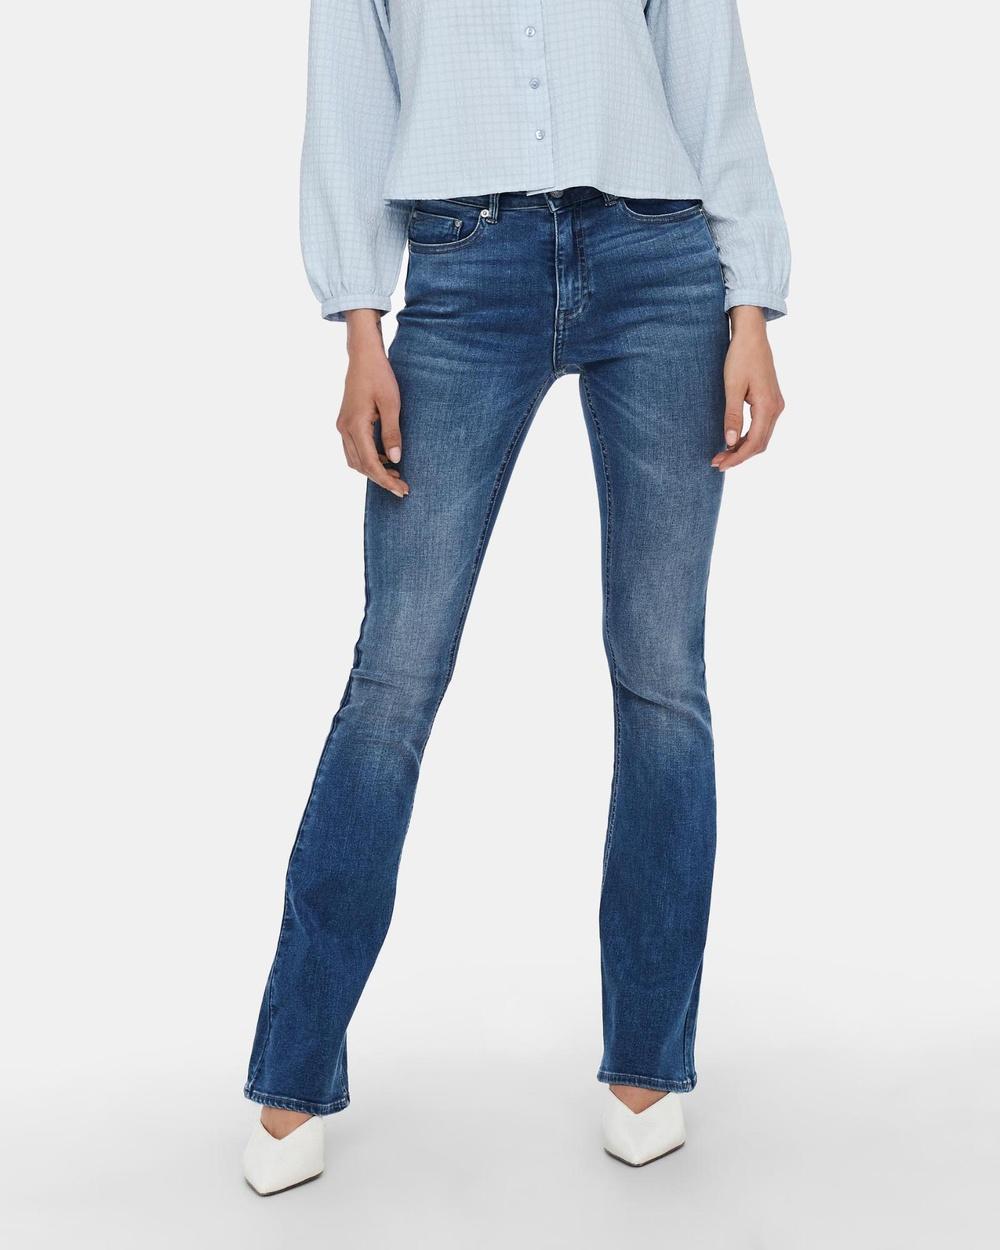 ONLY Paola Life High Waisted Flared Jeans High-Waisted Medium Blue Denim Australia